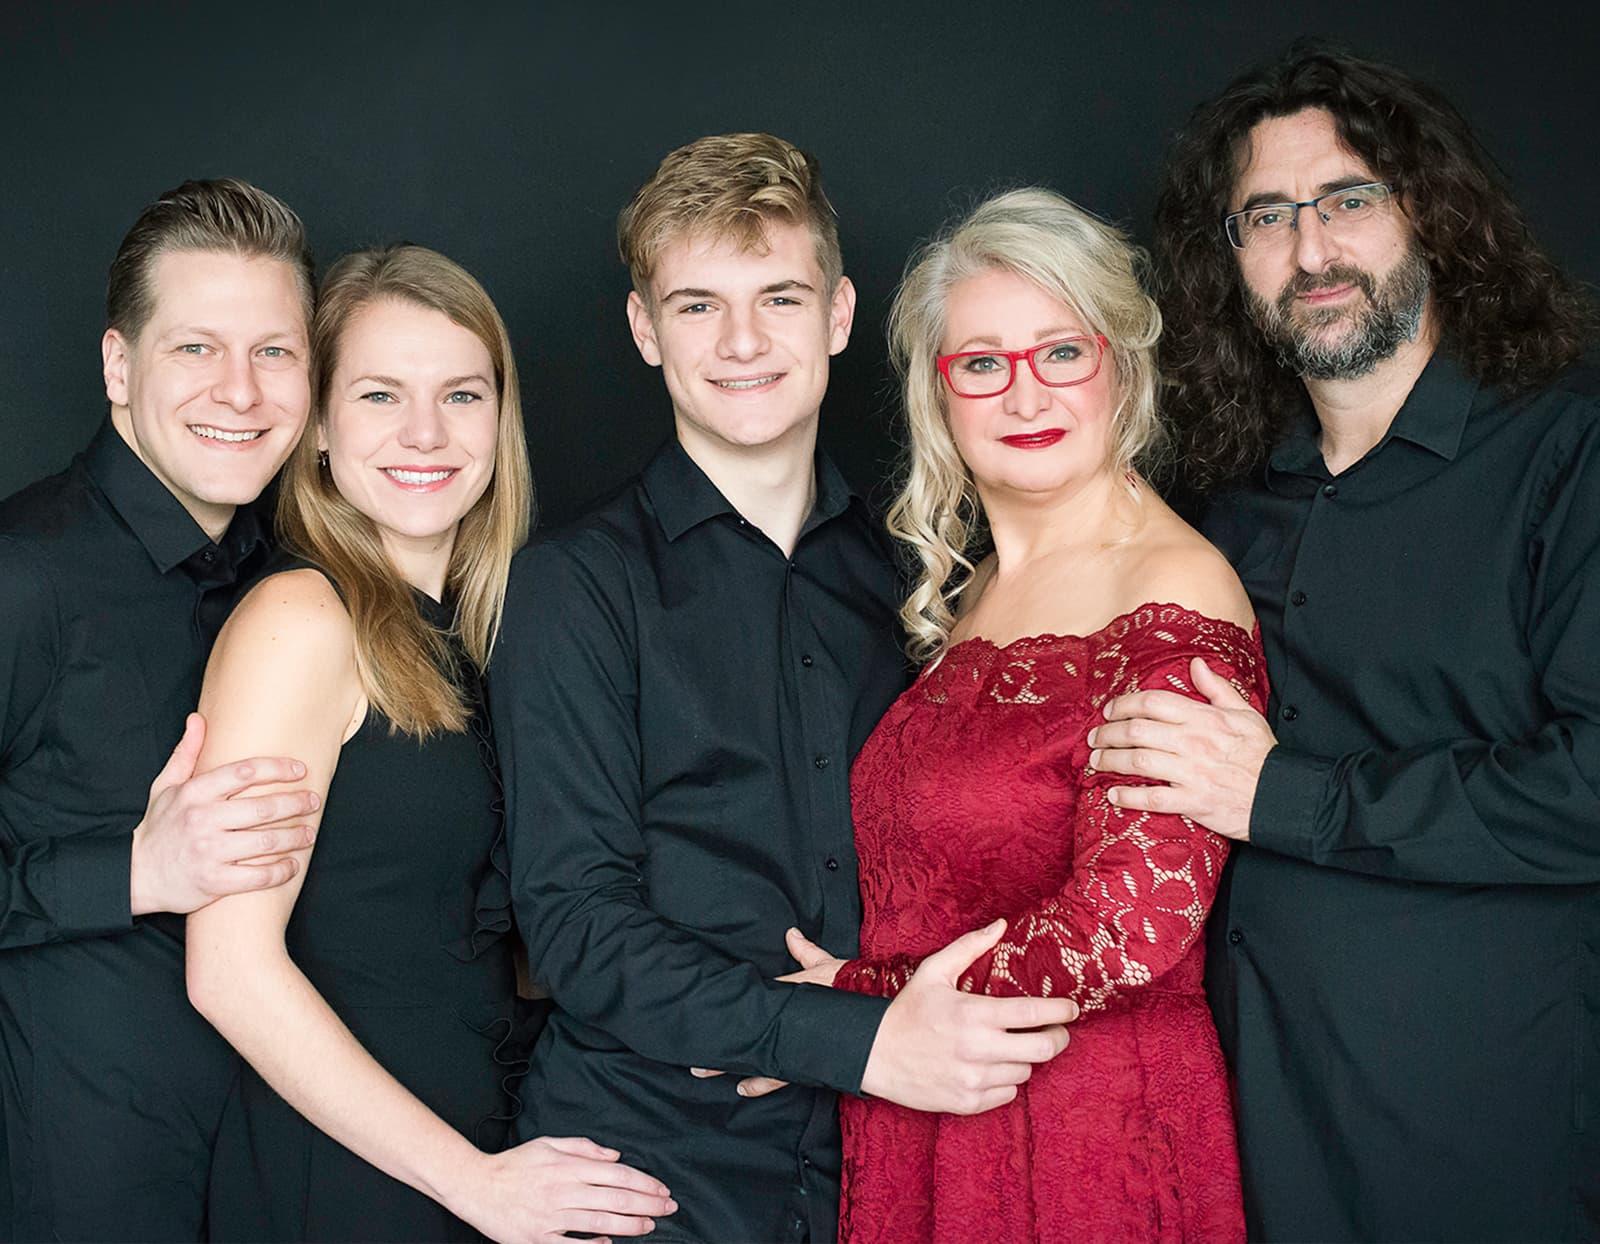 Familie fotoshoot 8